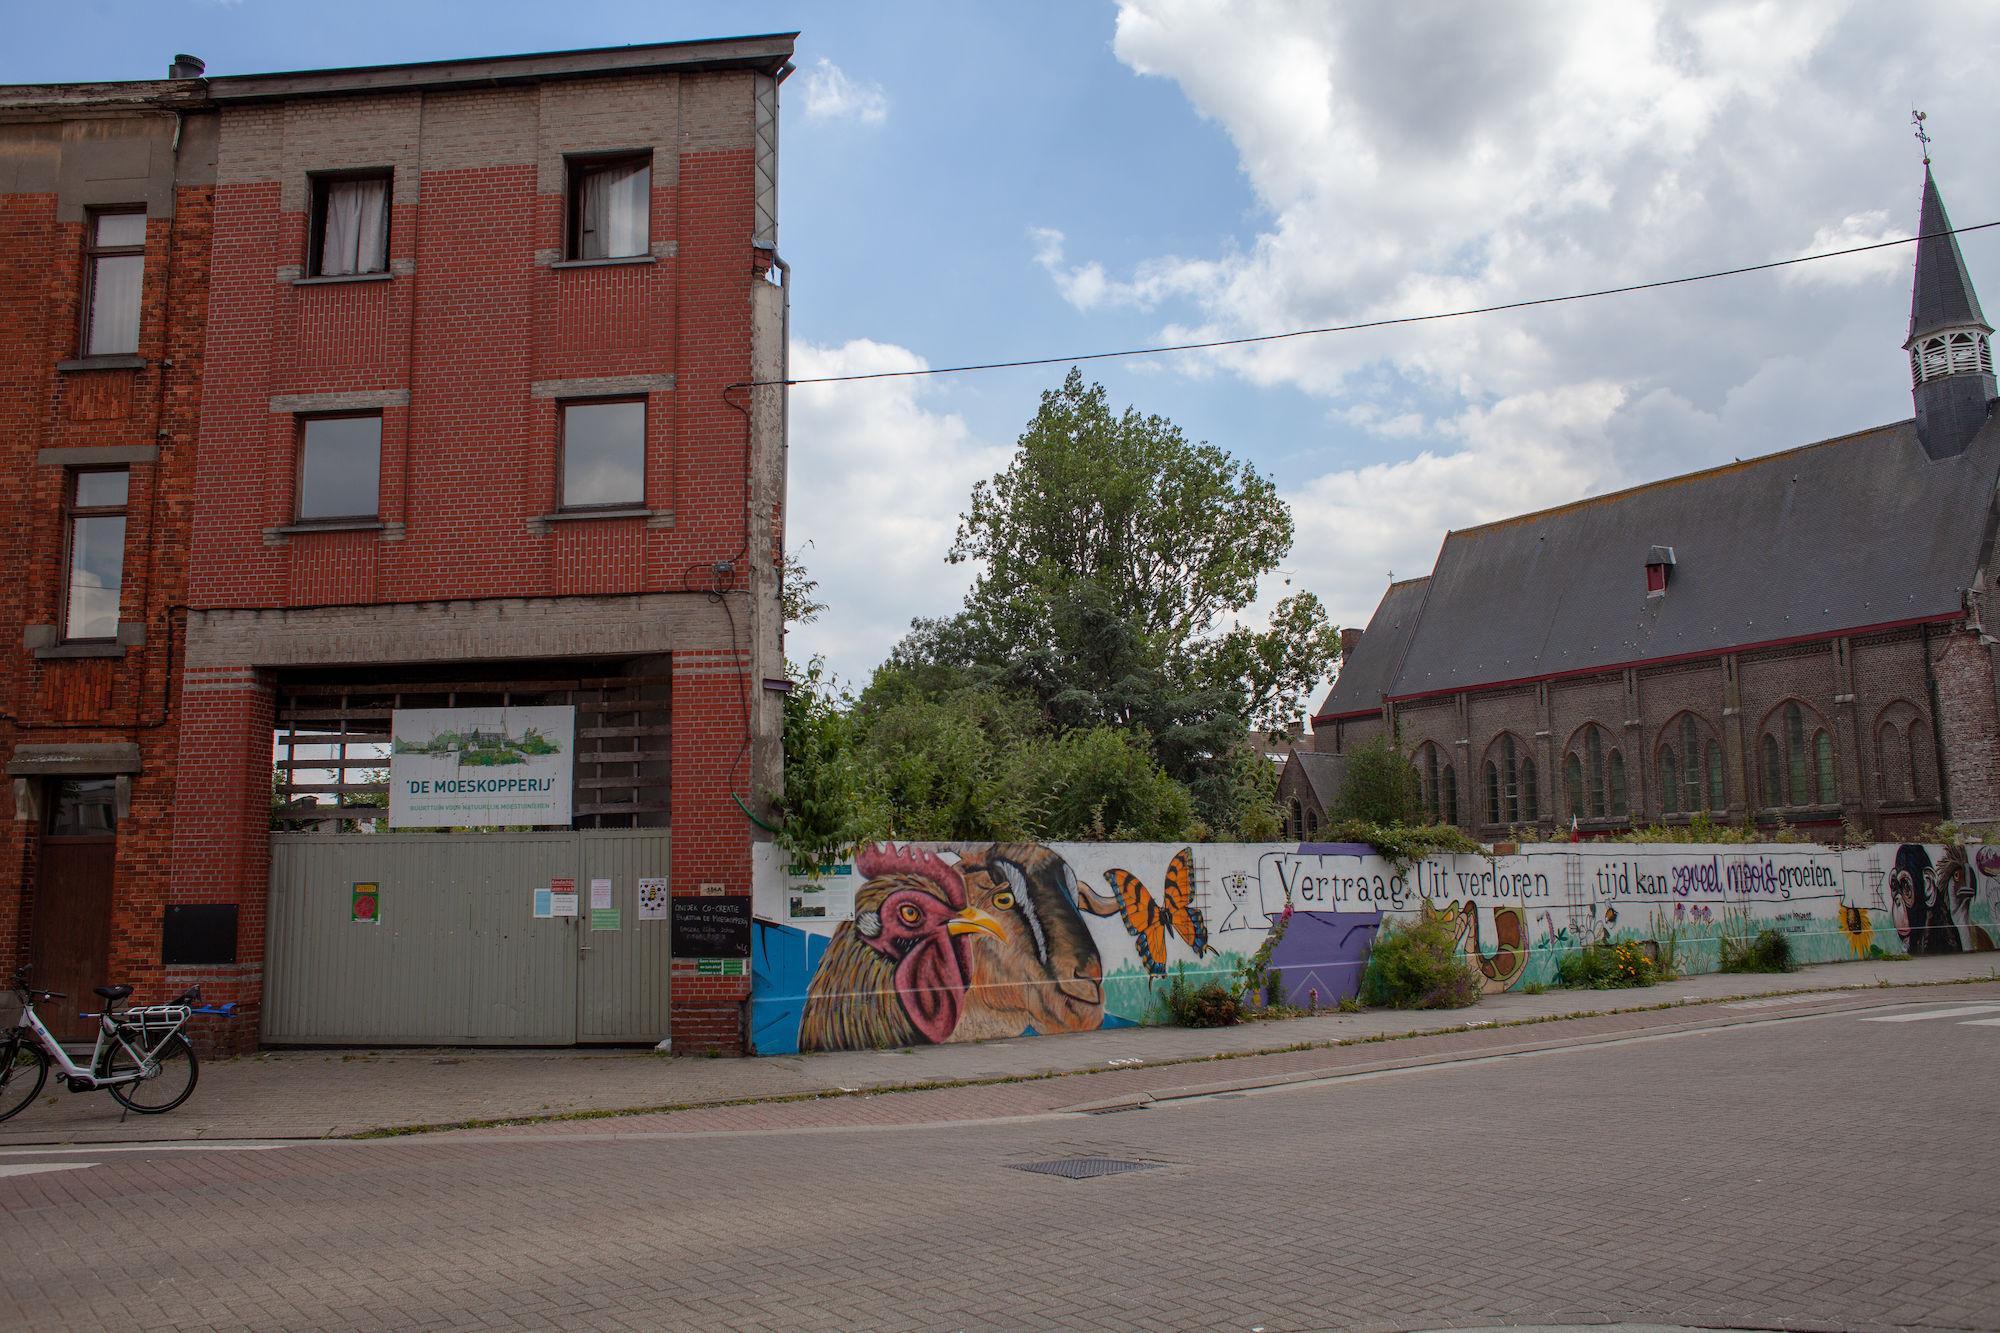 2019-07-02 Muide Meulestede prospectie Wannes_stadsvernieuwing_IMG_0310-3.jpg